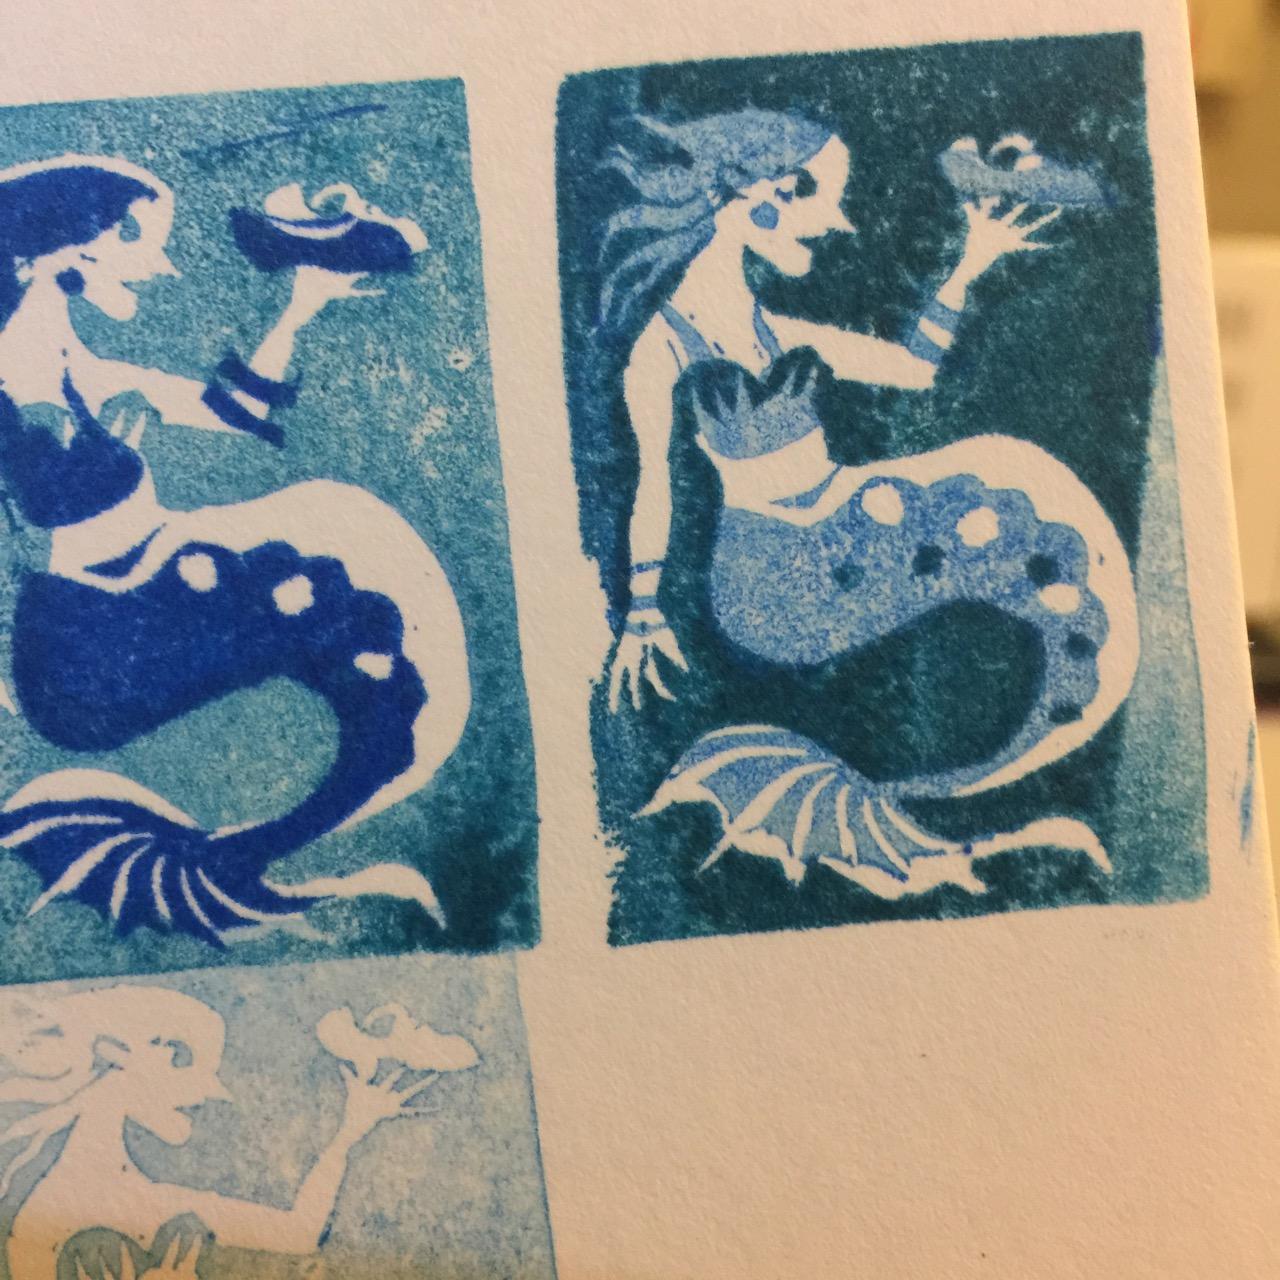 2020-03-18-KJennings-Mermaid